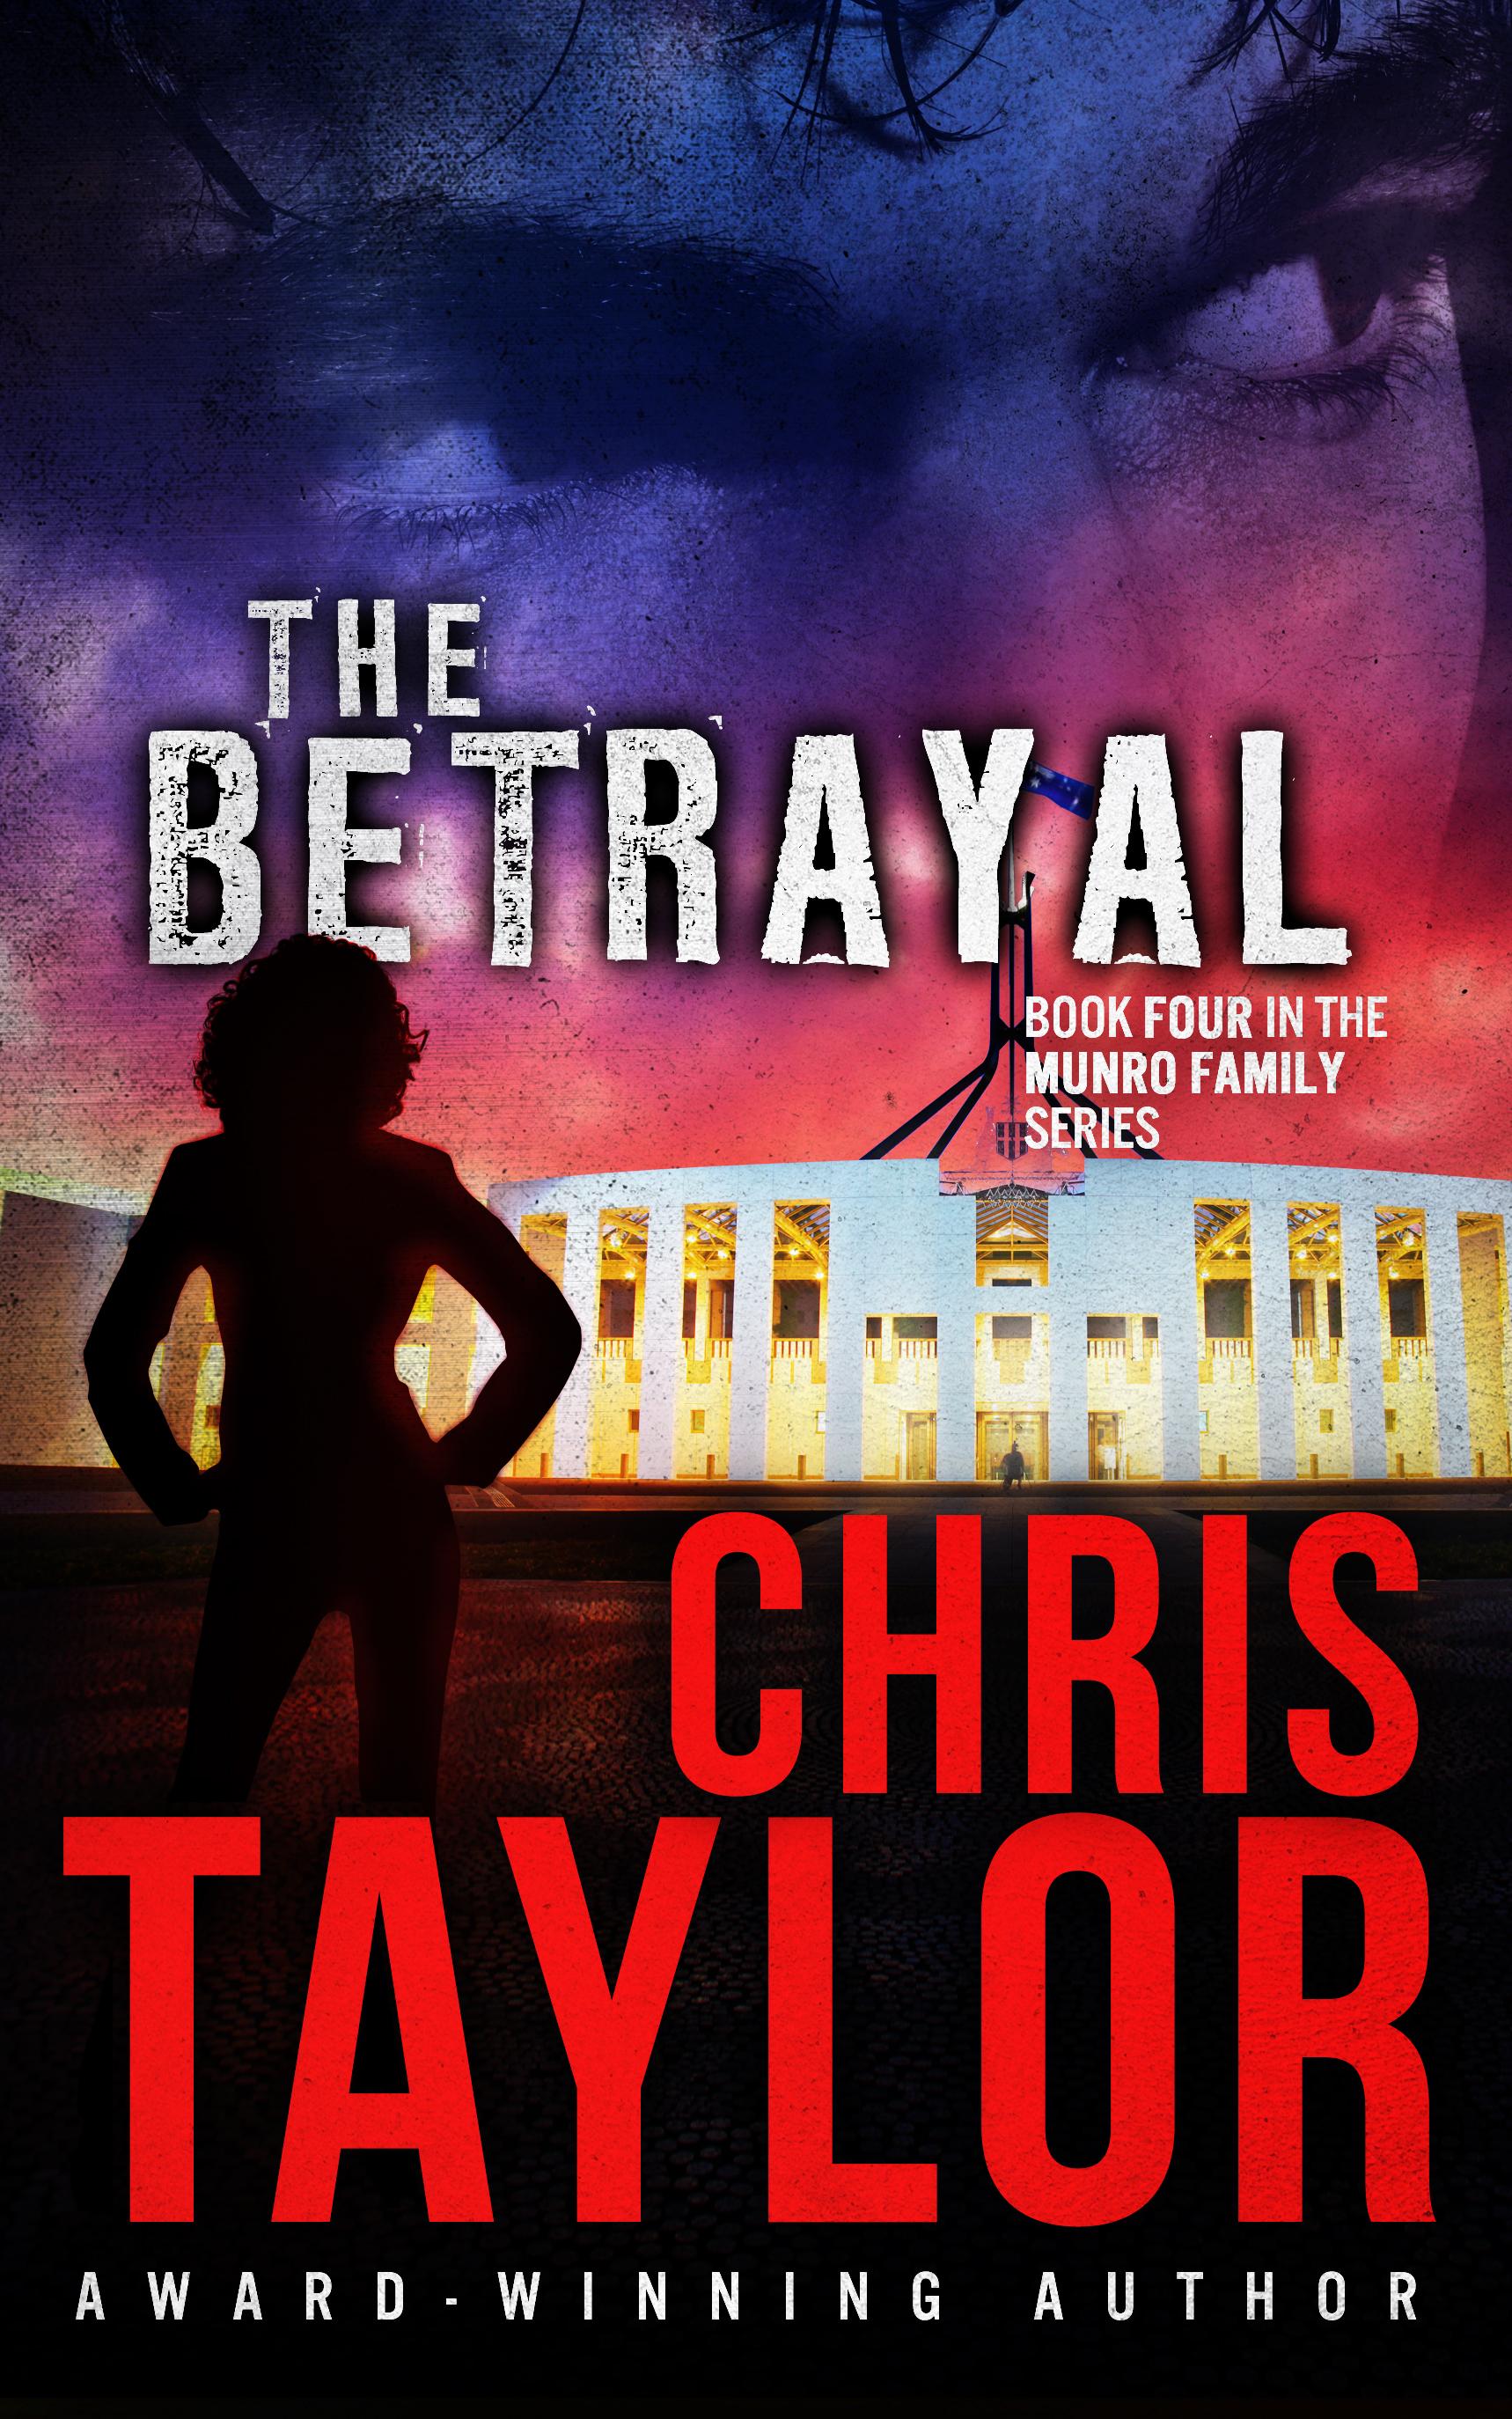 The Betrayal - Book 4